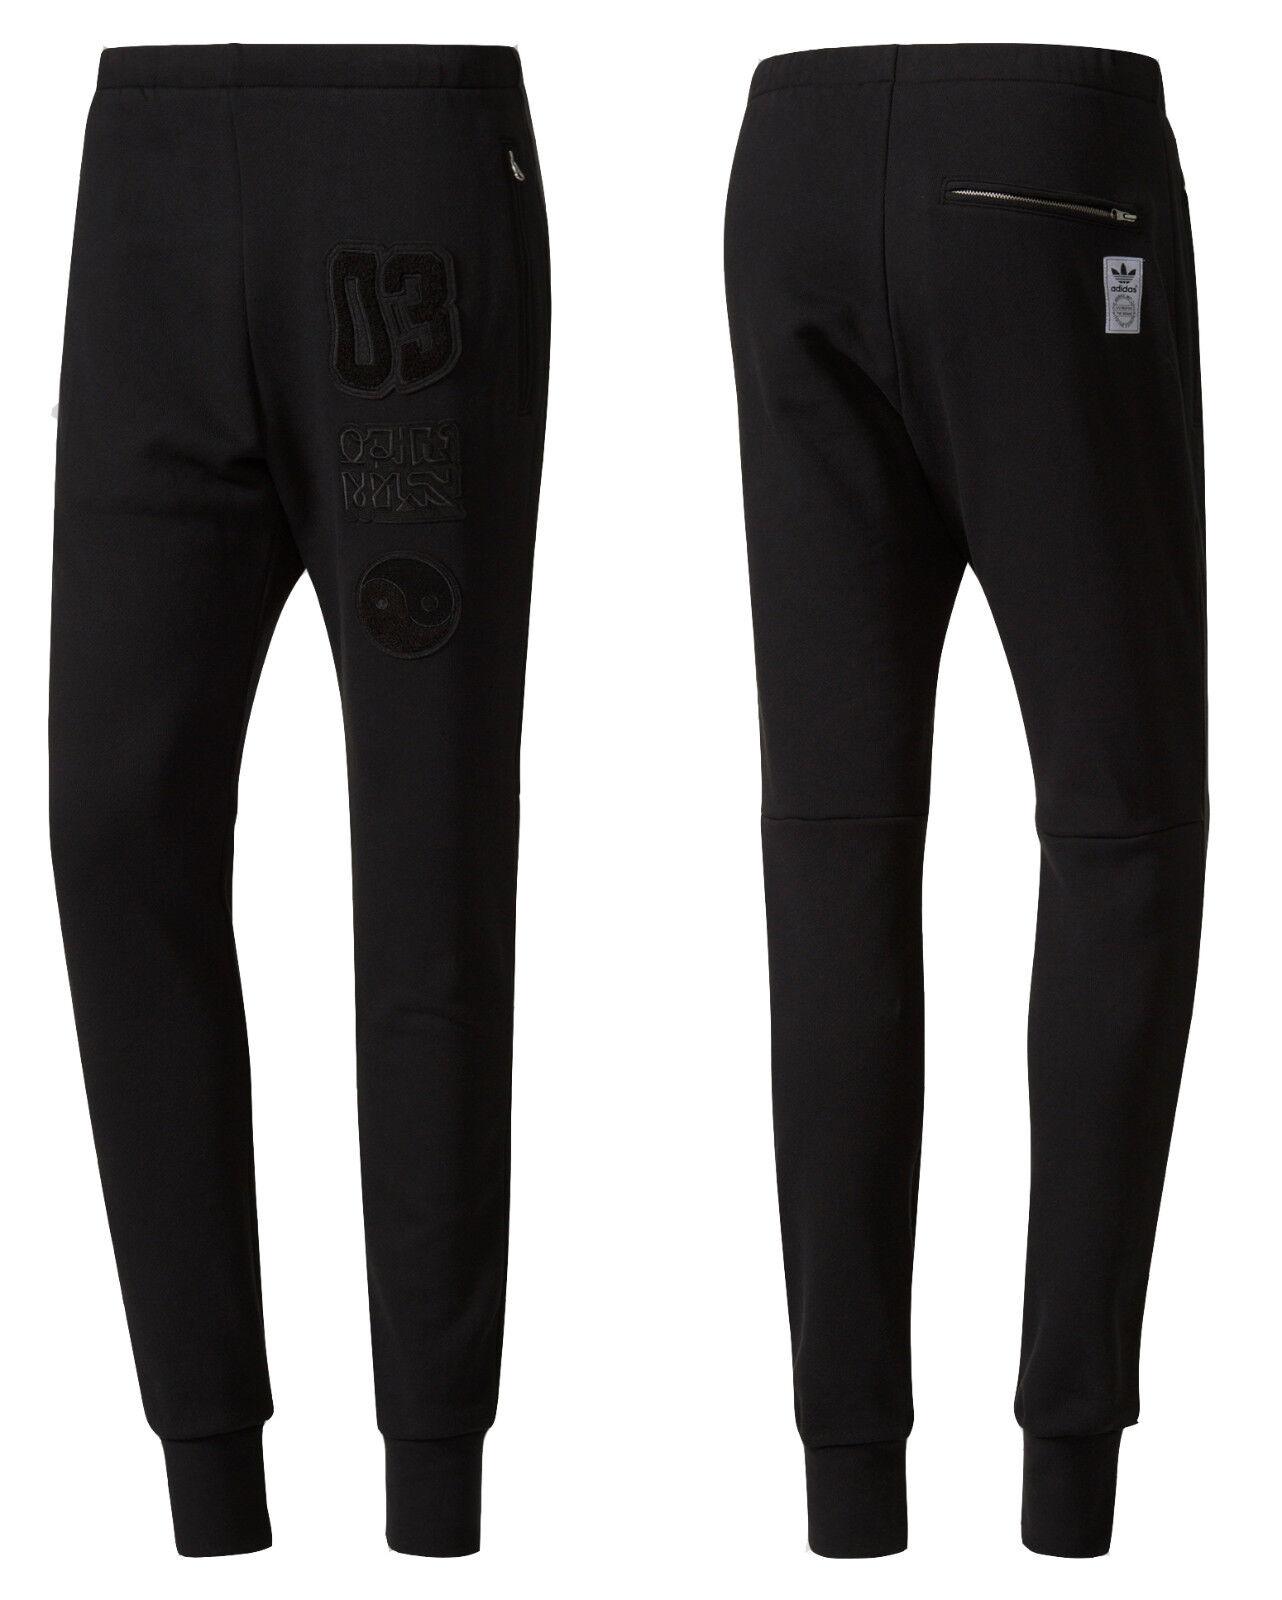 Adidas Original Winter Jogginghose Trainingshose Schwarz Herren BS2639 M14